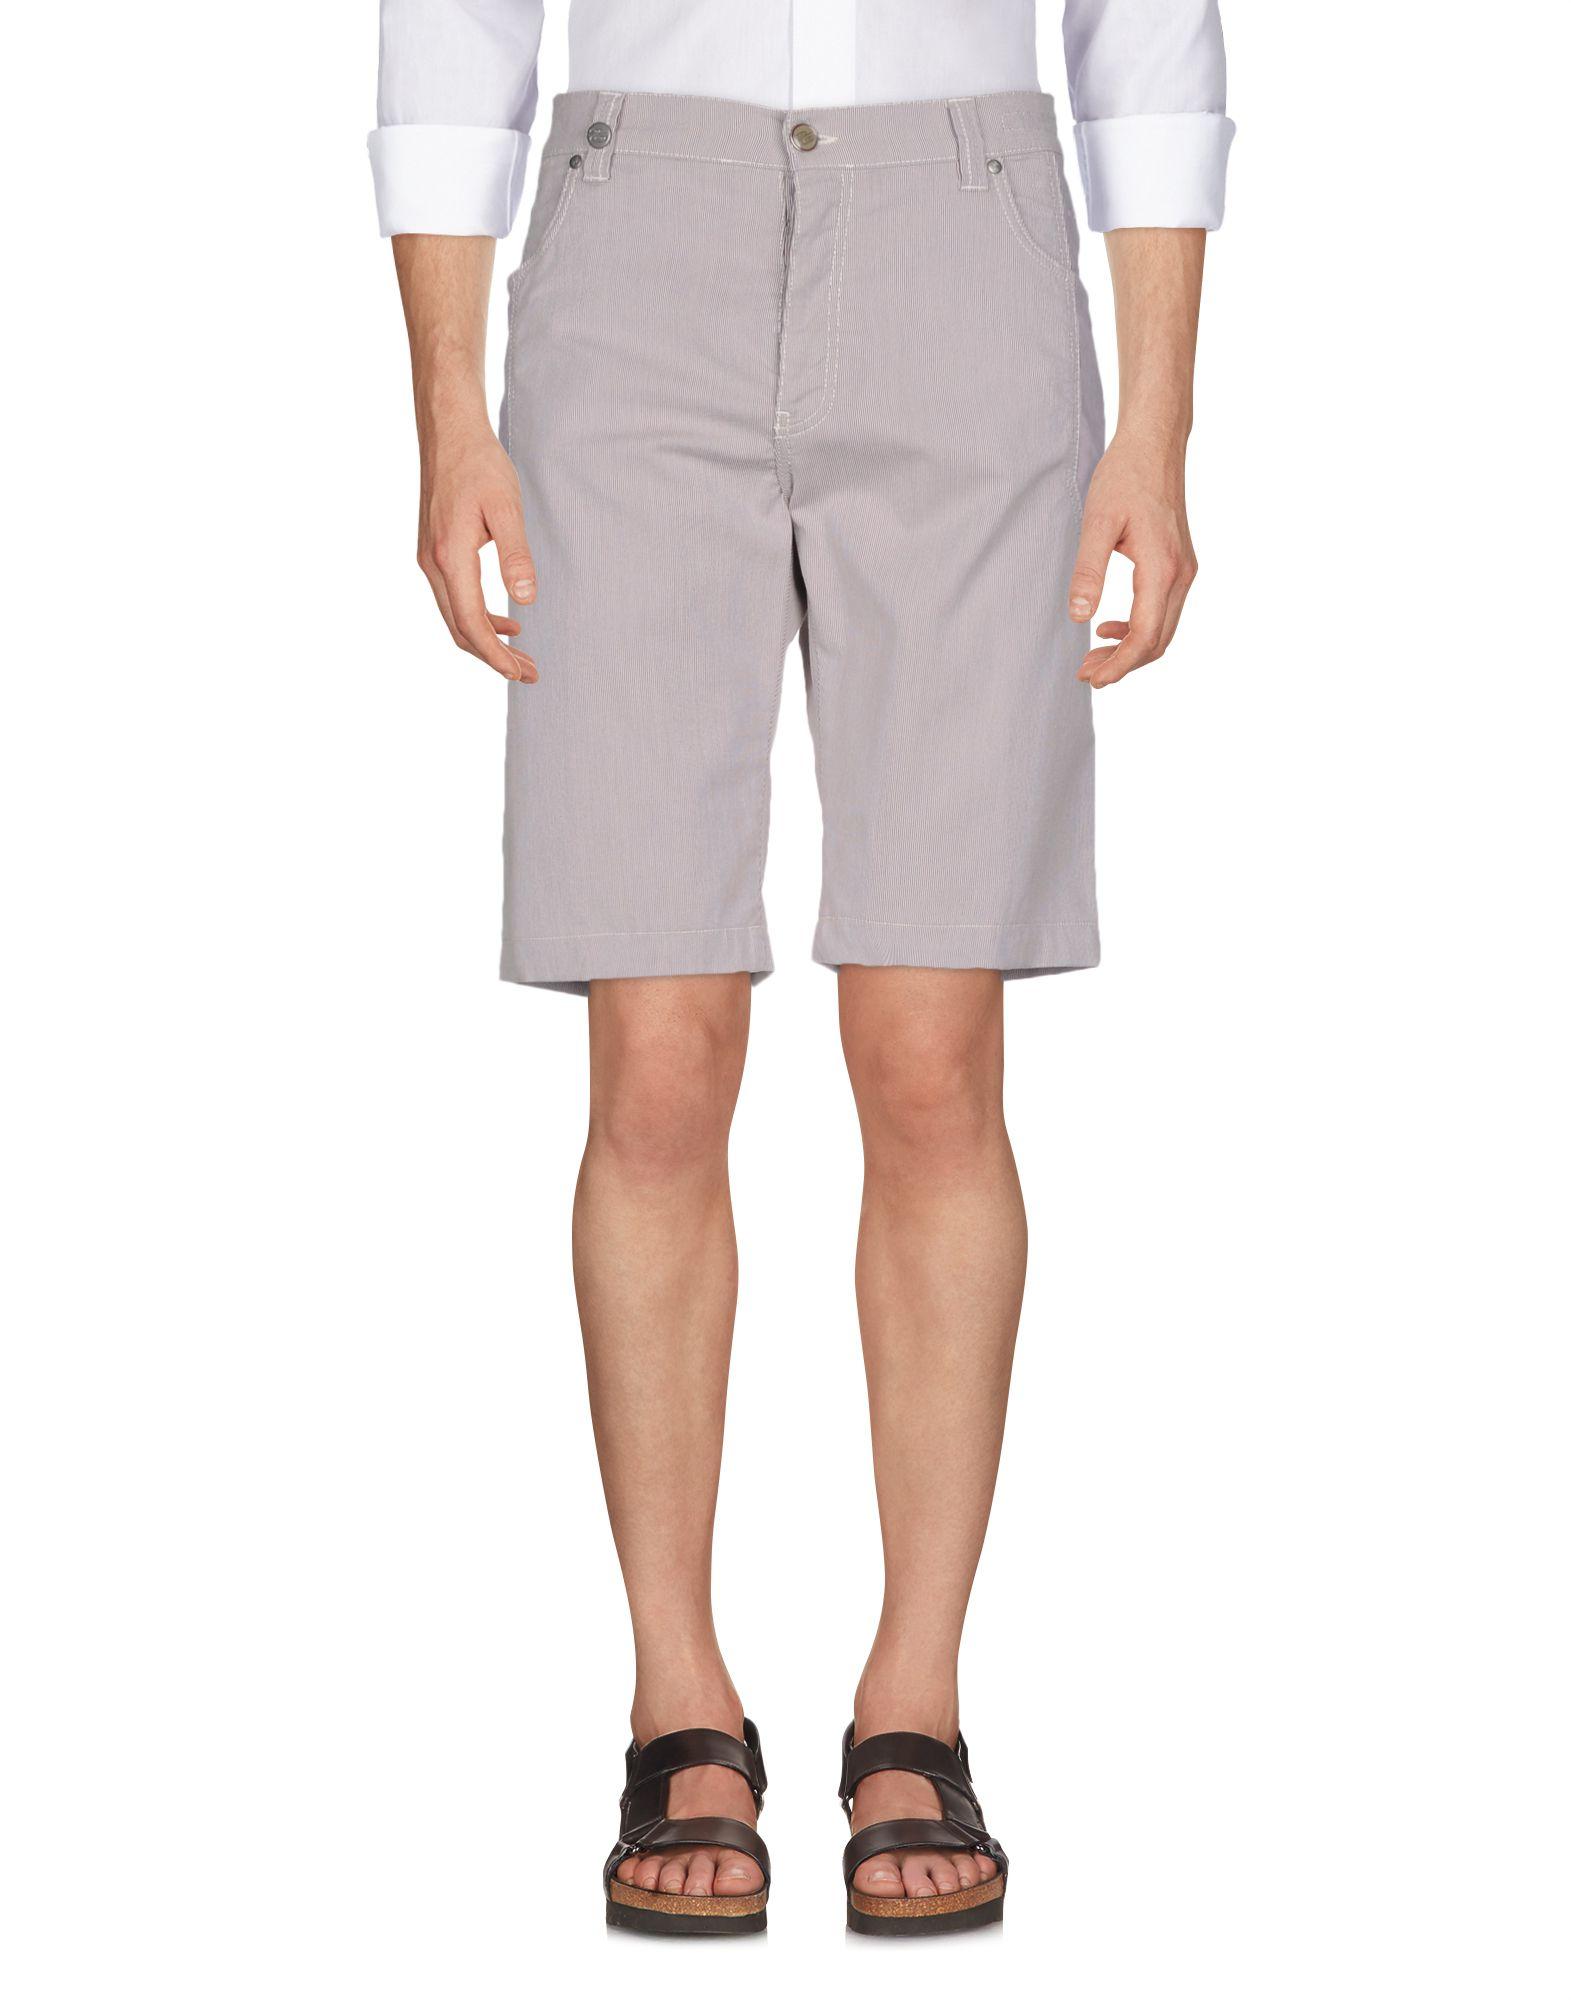 Shorts Nicwave Uomo - Acquista online su